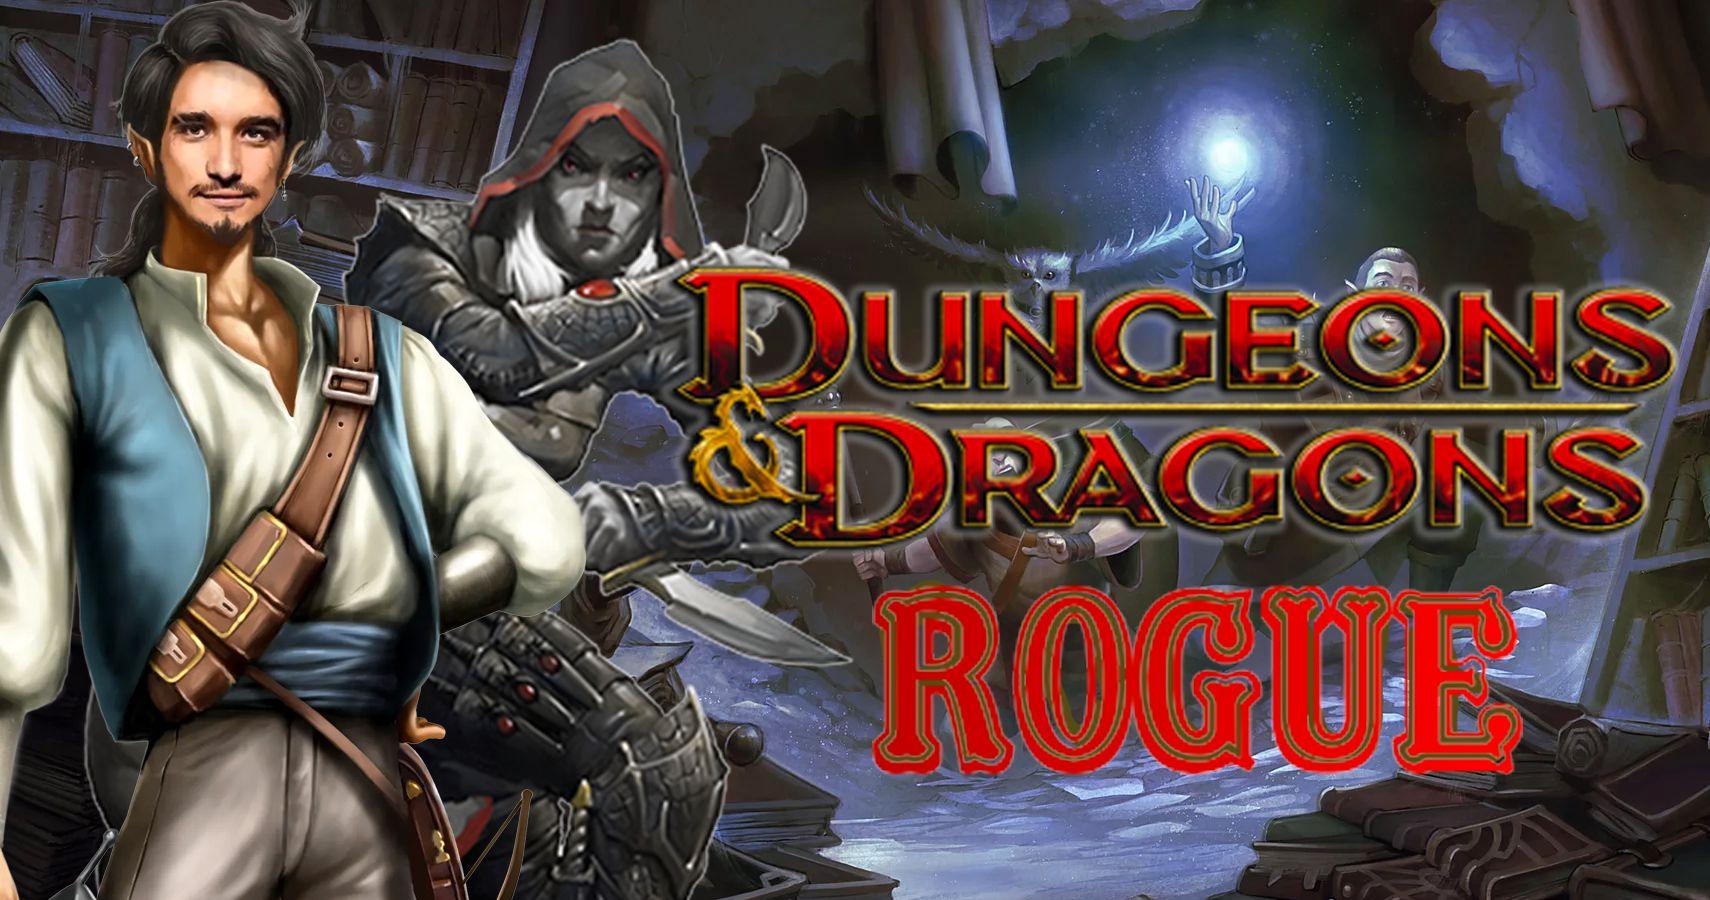 Dungeons & Dragons: todas las subclases oficiales de pícaros, clasificadas